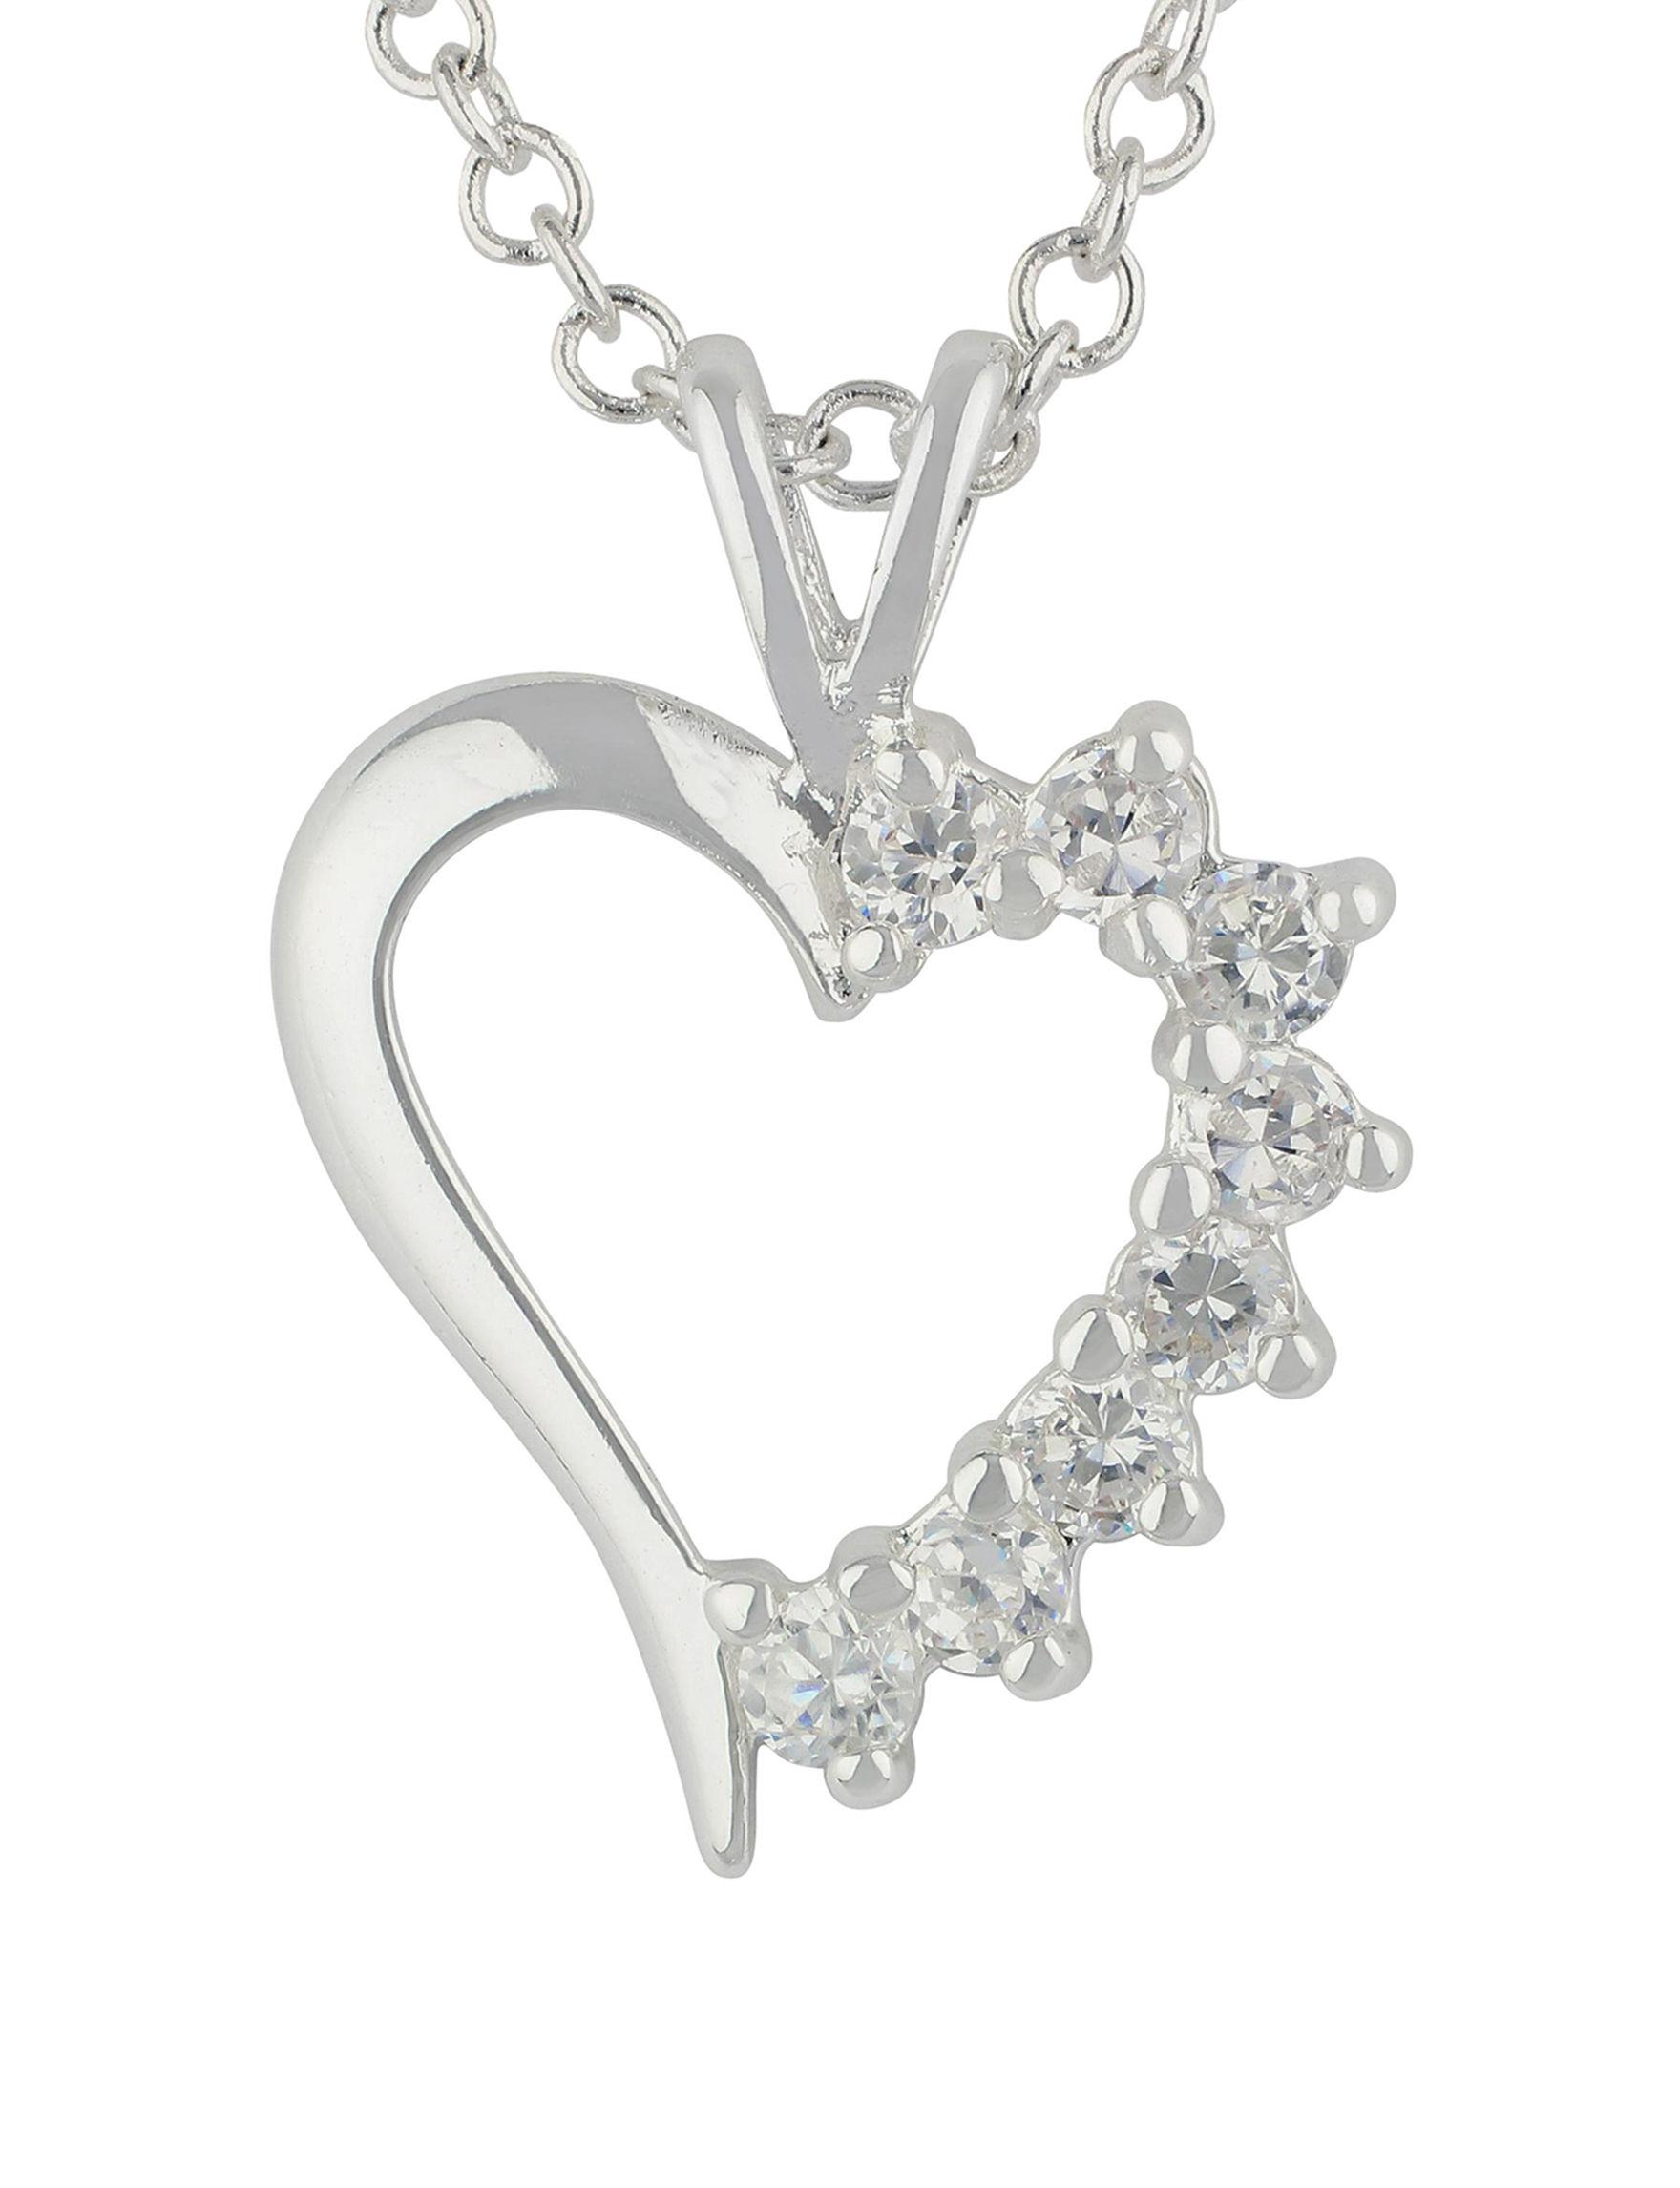 Sunstone Sterling Silver Necklaces & Pendants Fine Jewelry